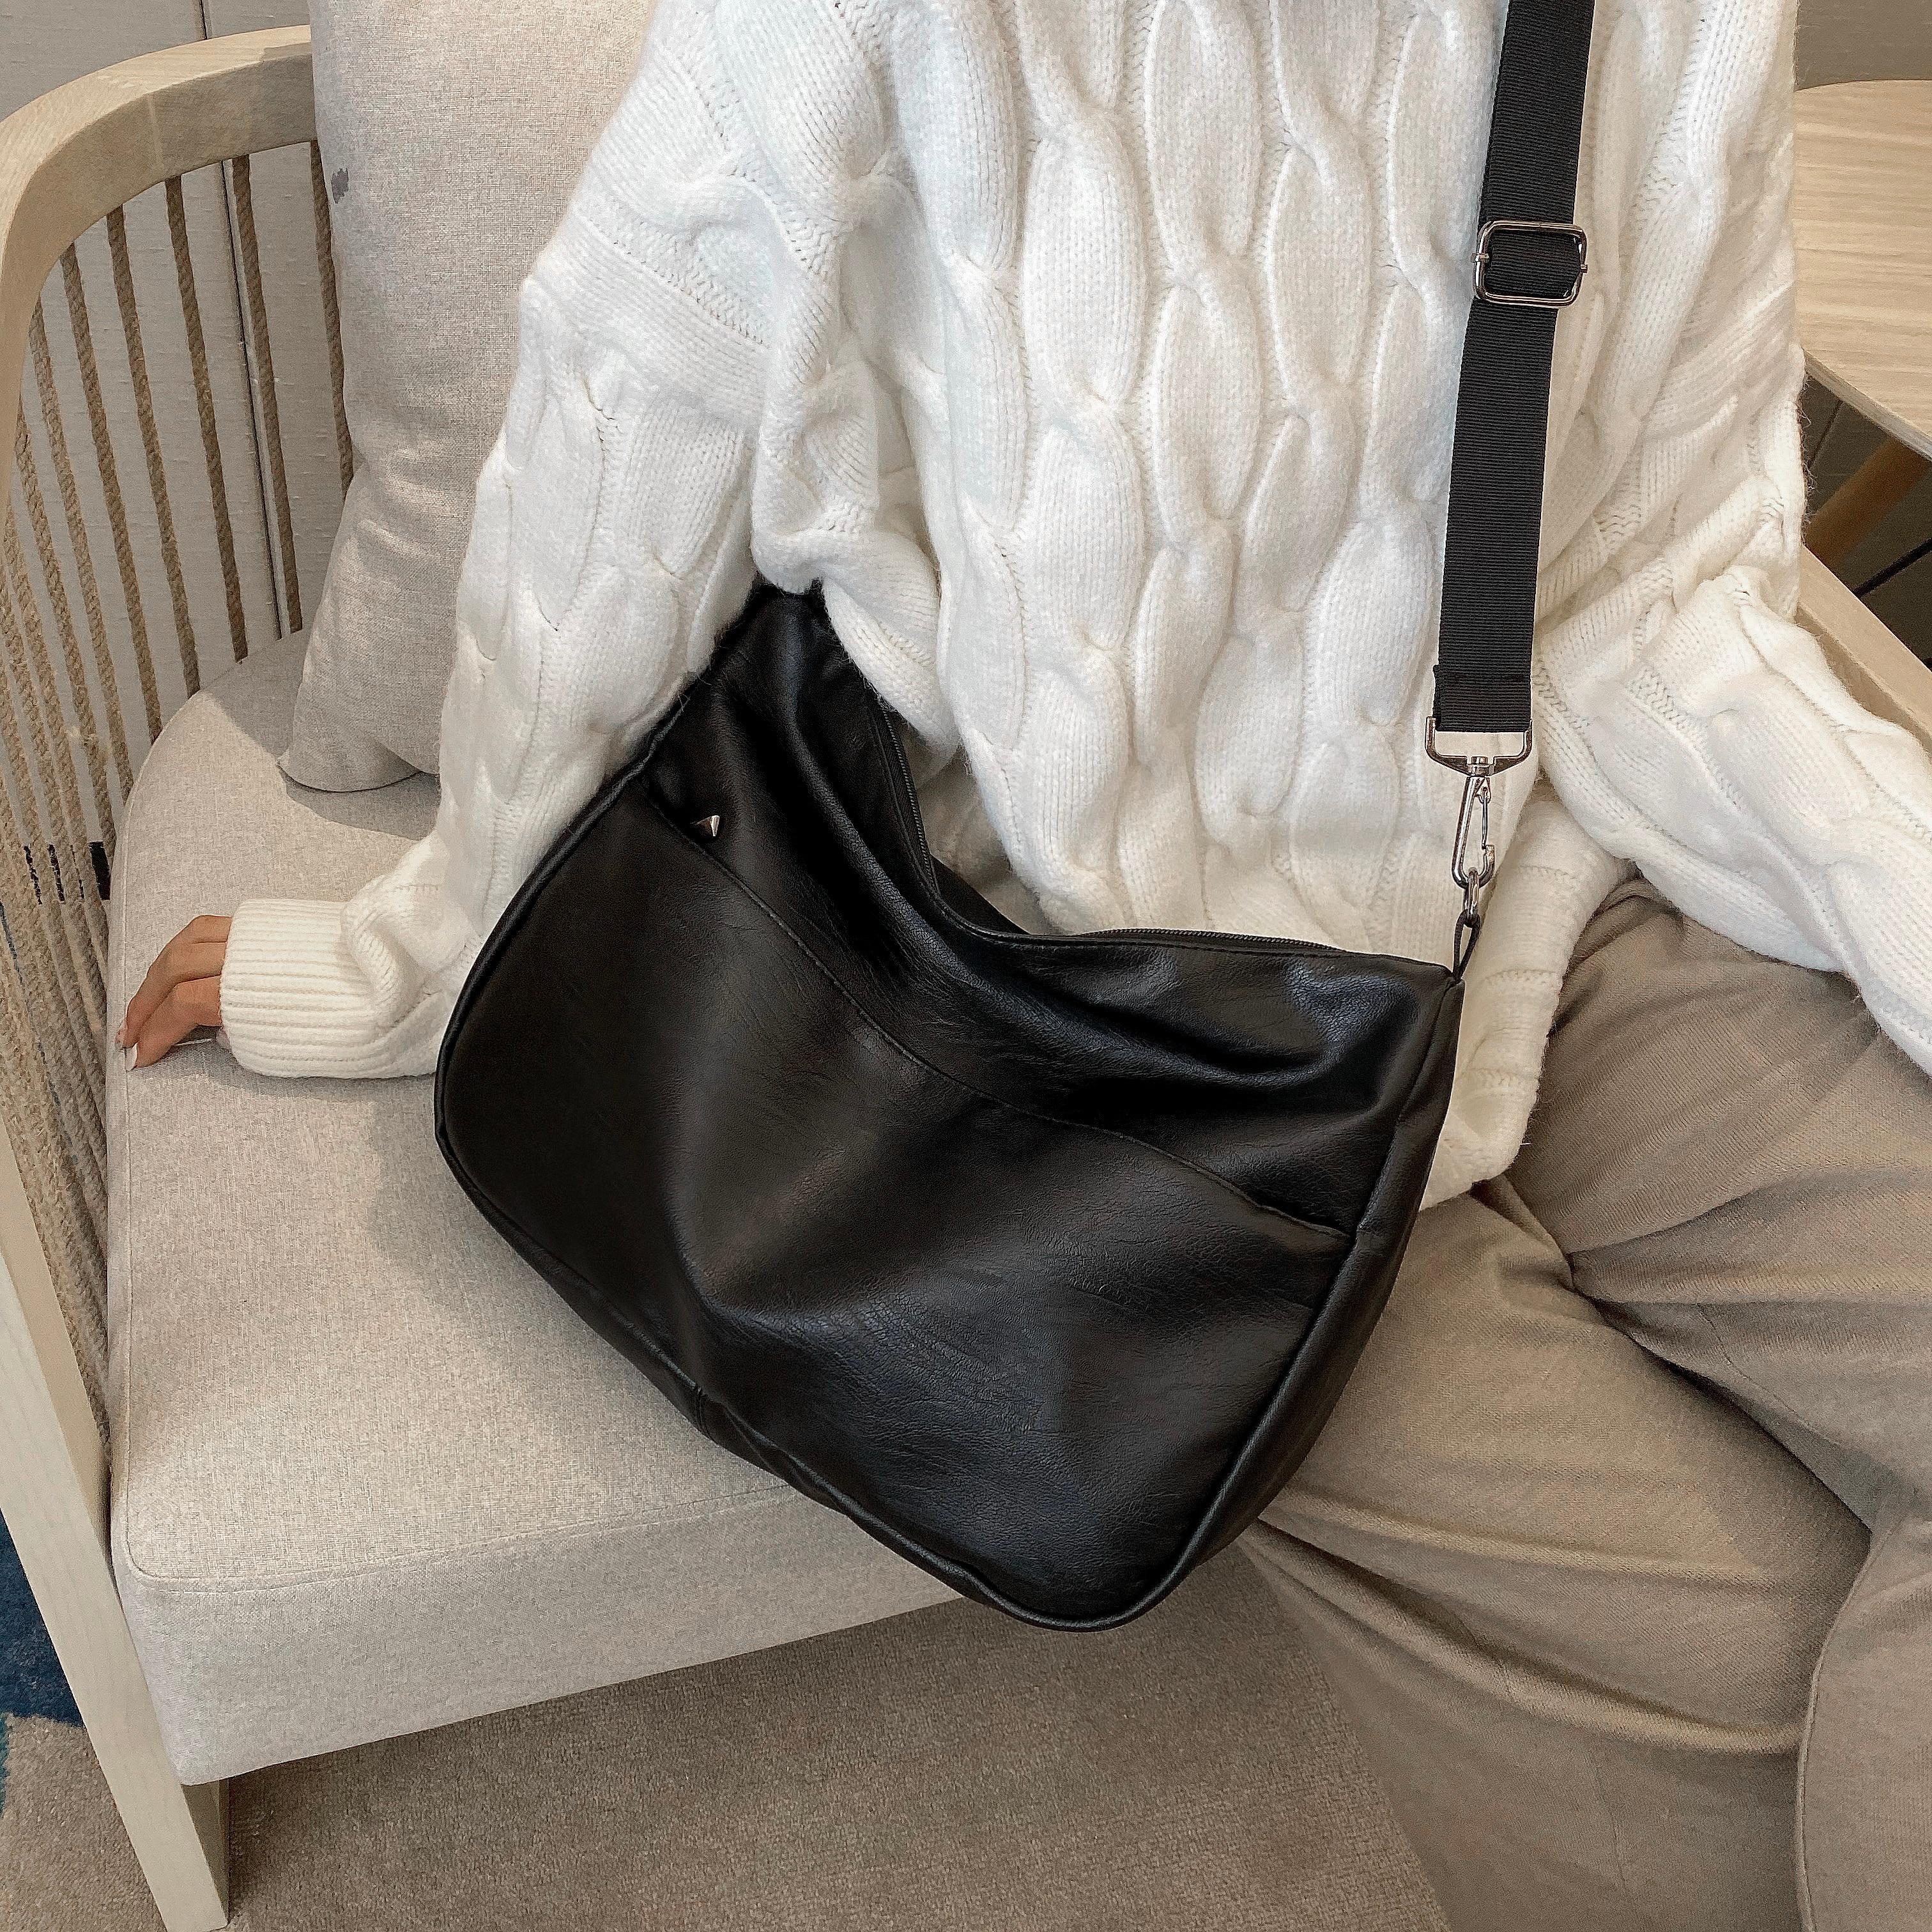 Soft PU Leather Crossbody Bags For Women 2019 High Capacity Shoulder Messenger Bag Female Travel Black Handbags